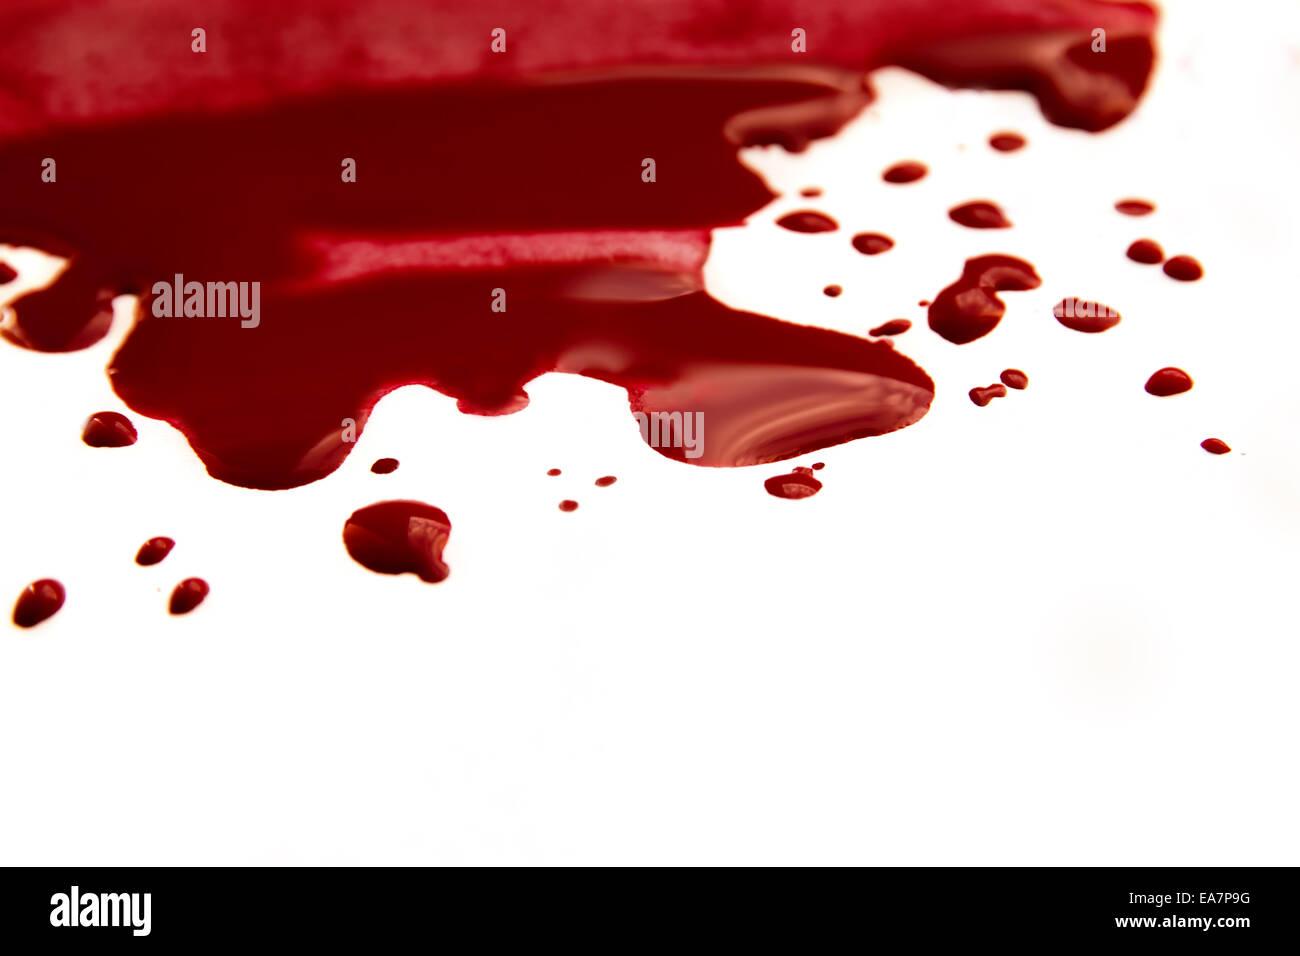 Blood stains (puddle, pool) isolated on white background close up, horizontal - Stock Image